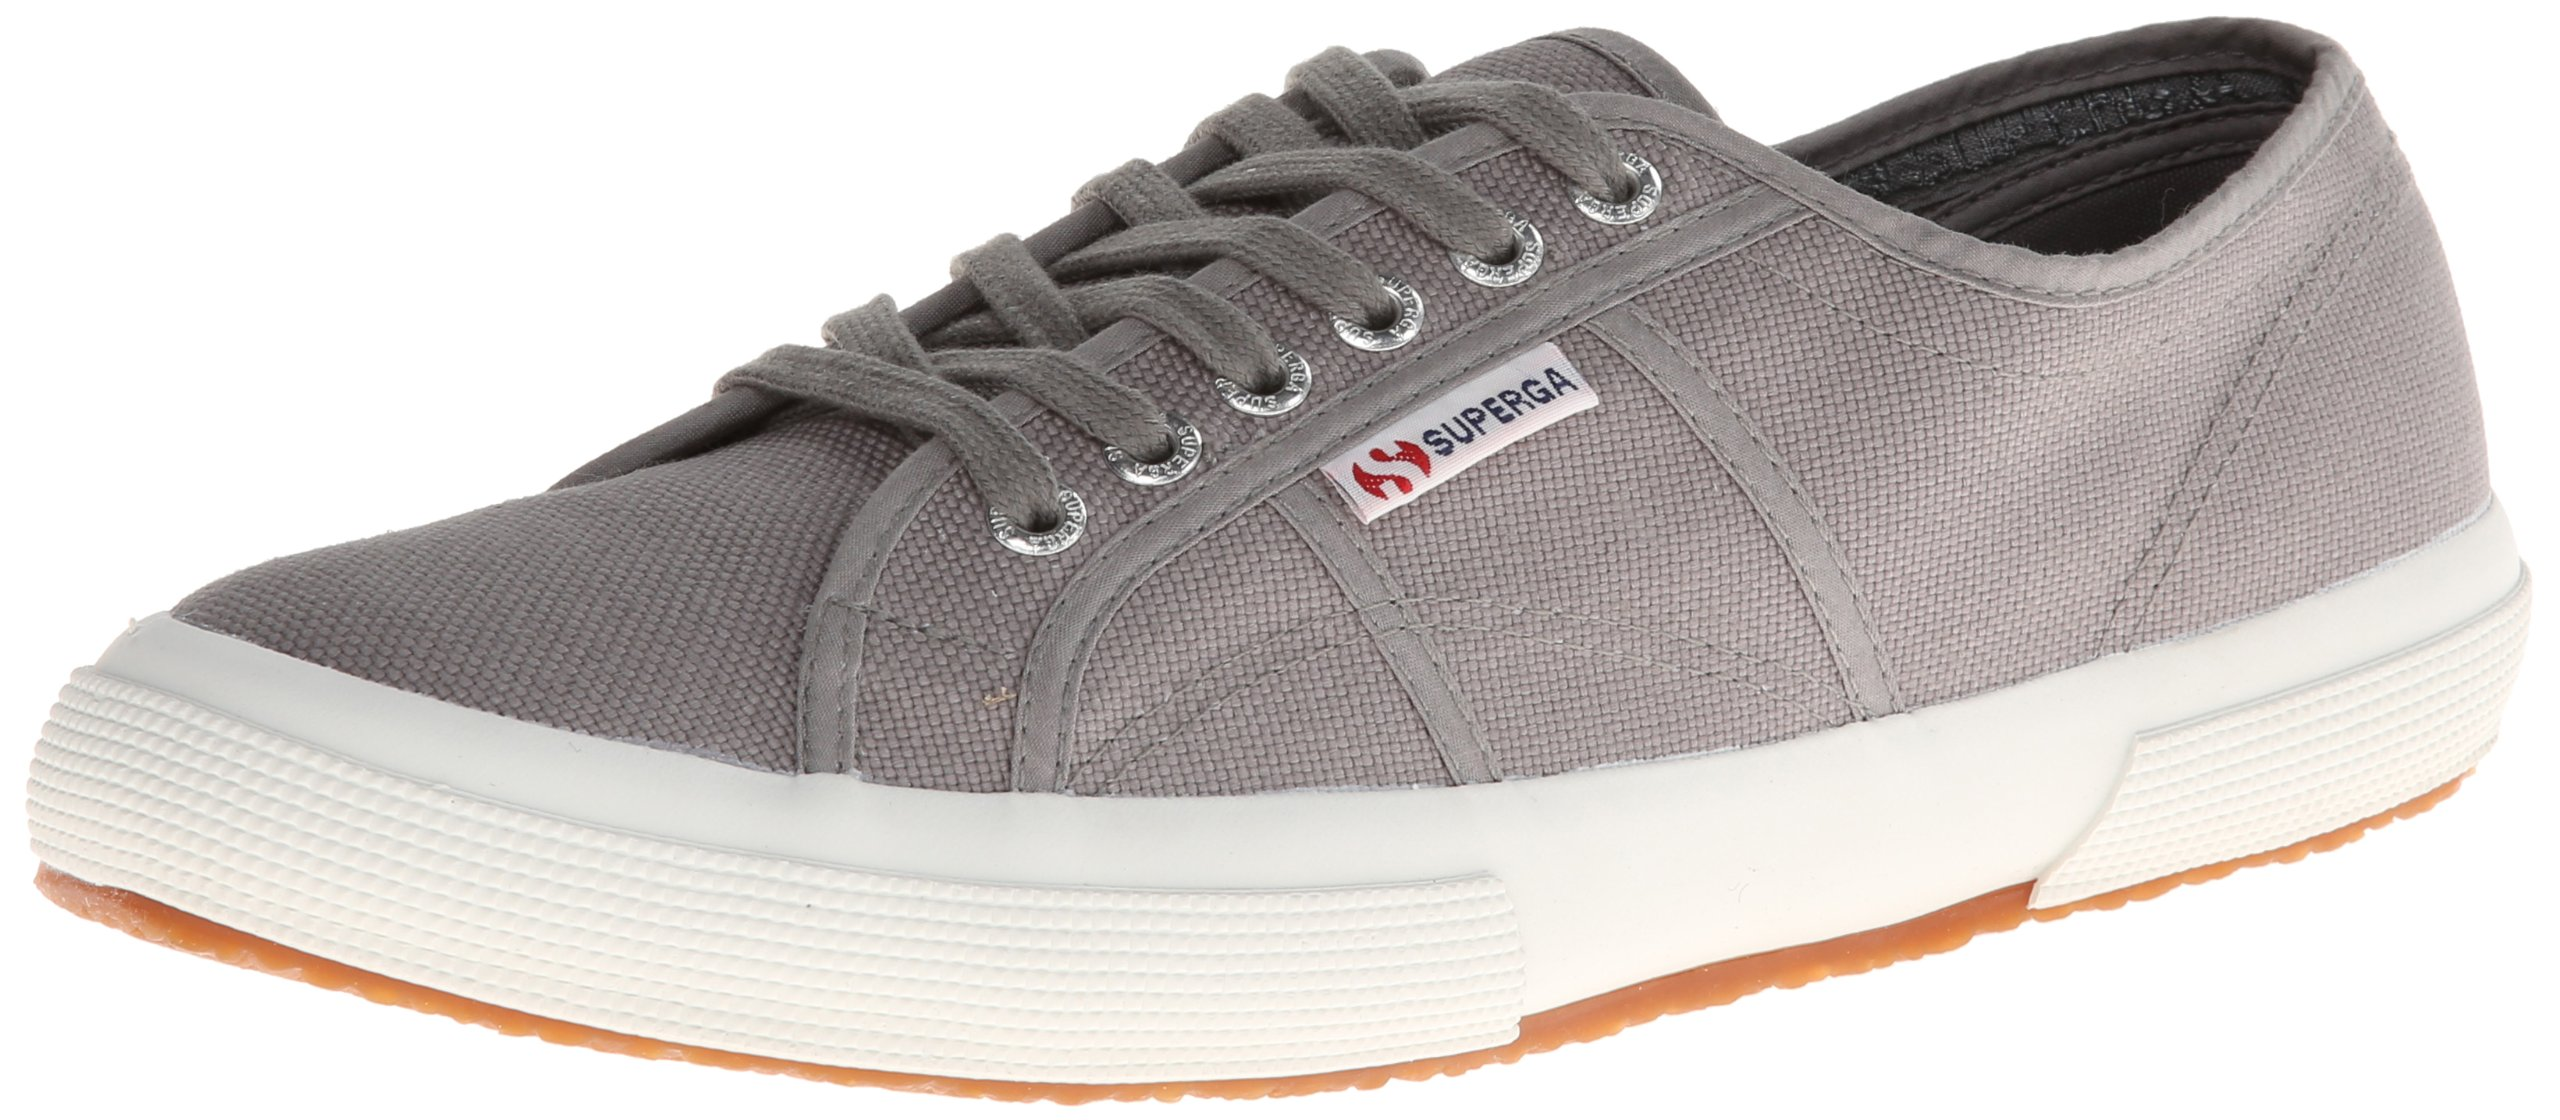 Superga Unisex 2750 Cotu  Grey Sage Classic Sneaker - 38 M EU / 7.5 B(M) US Women / 6 D(M) US Men